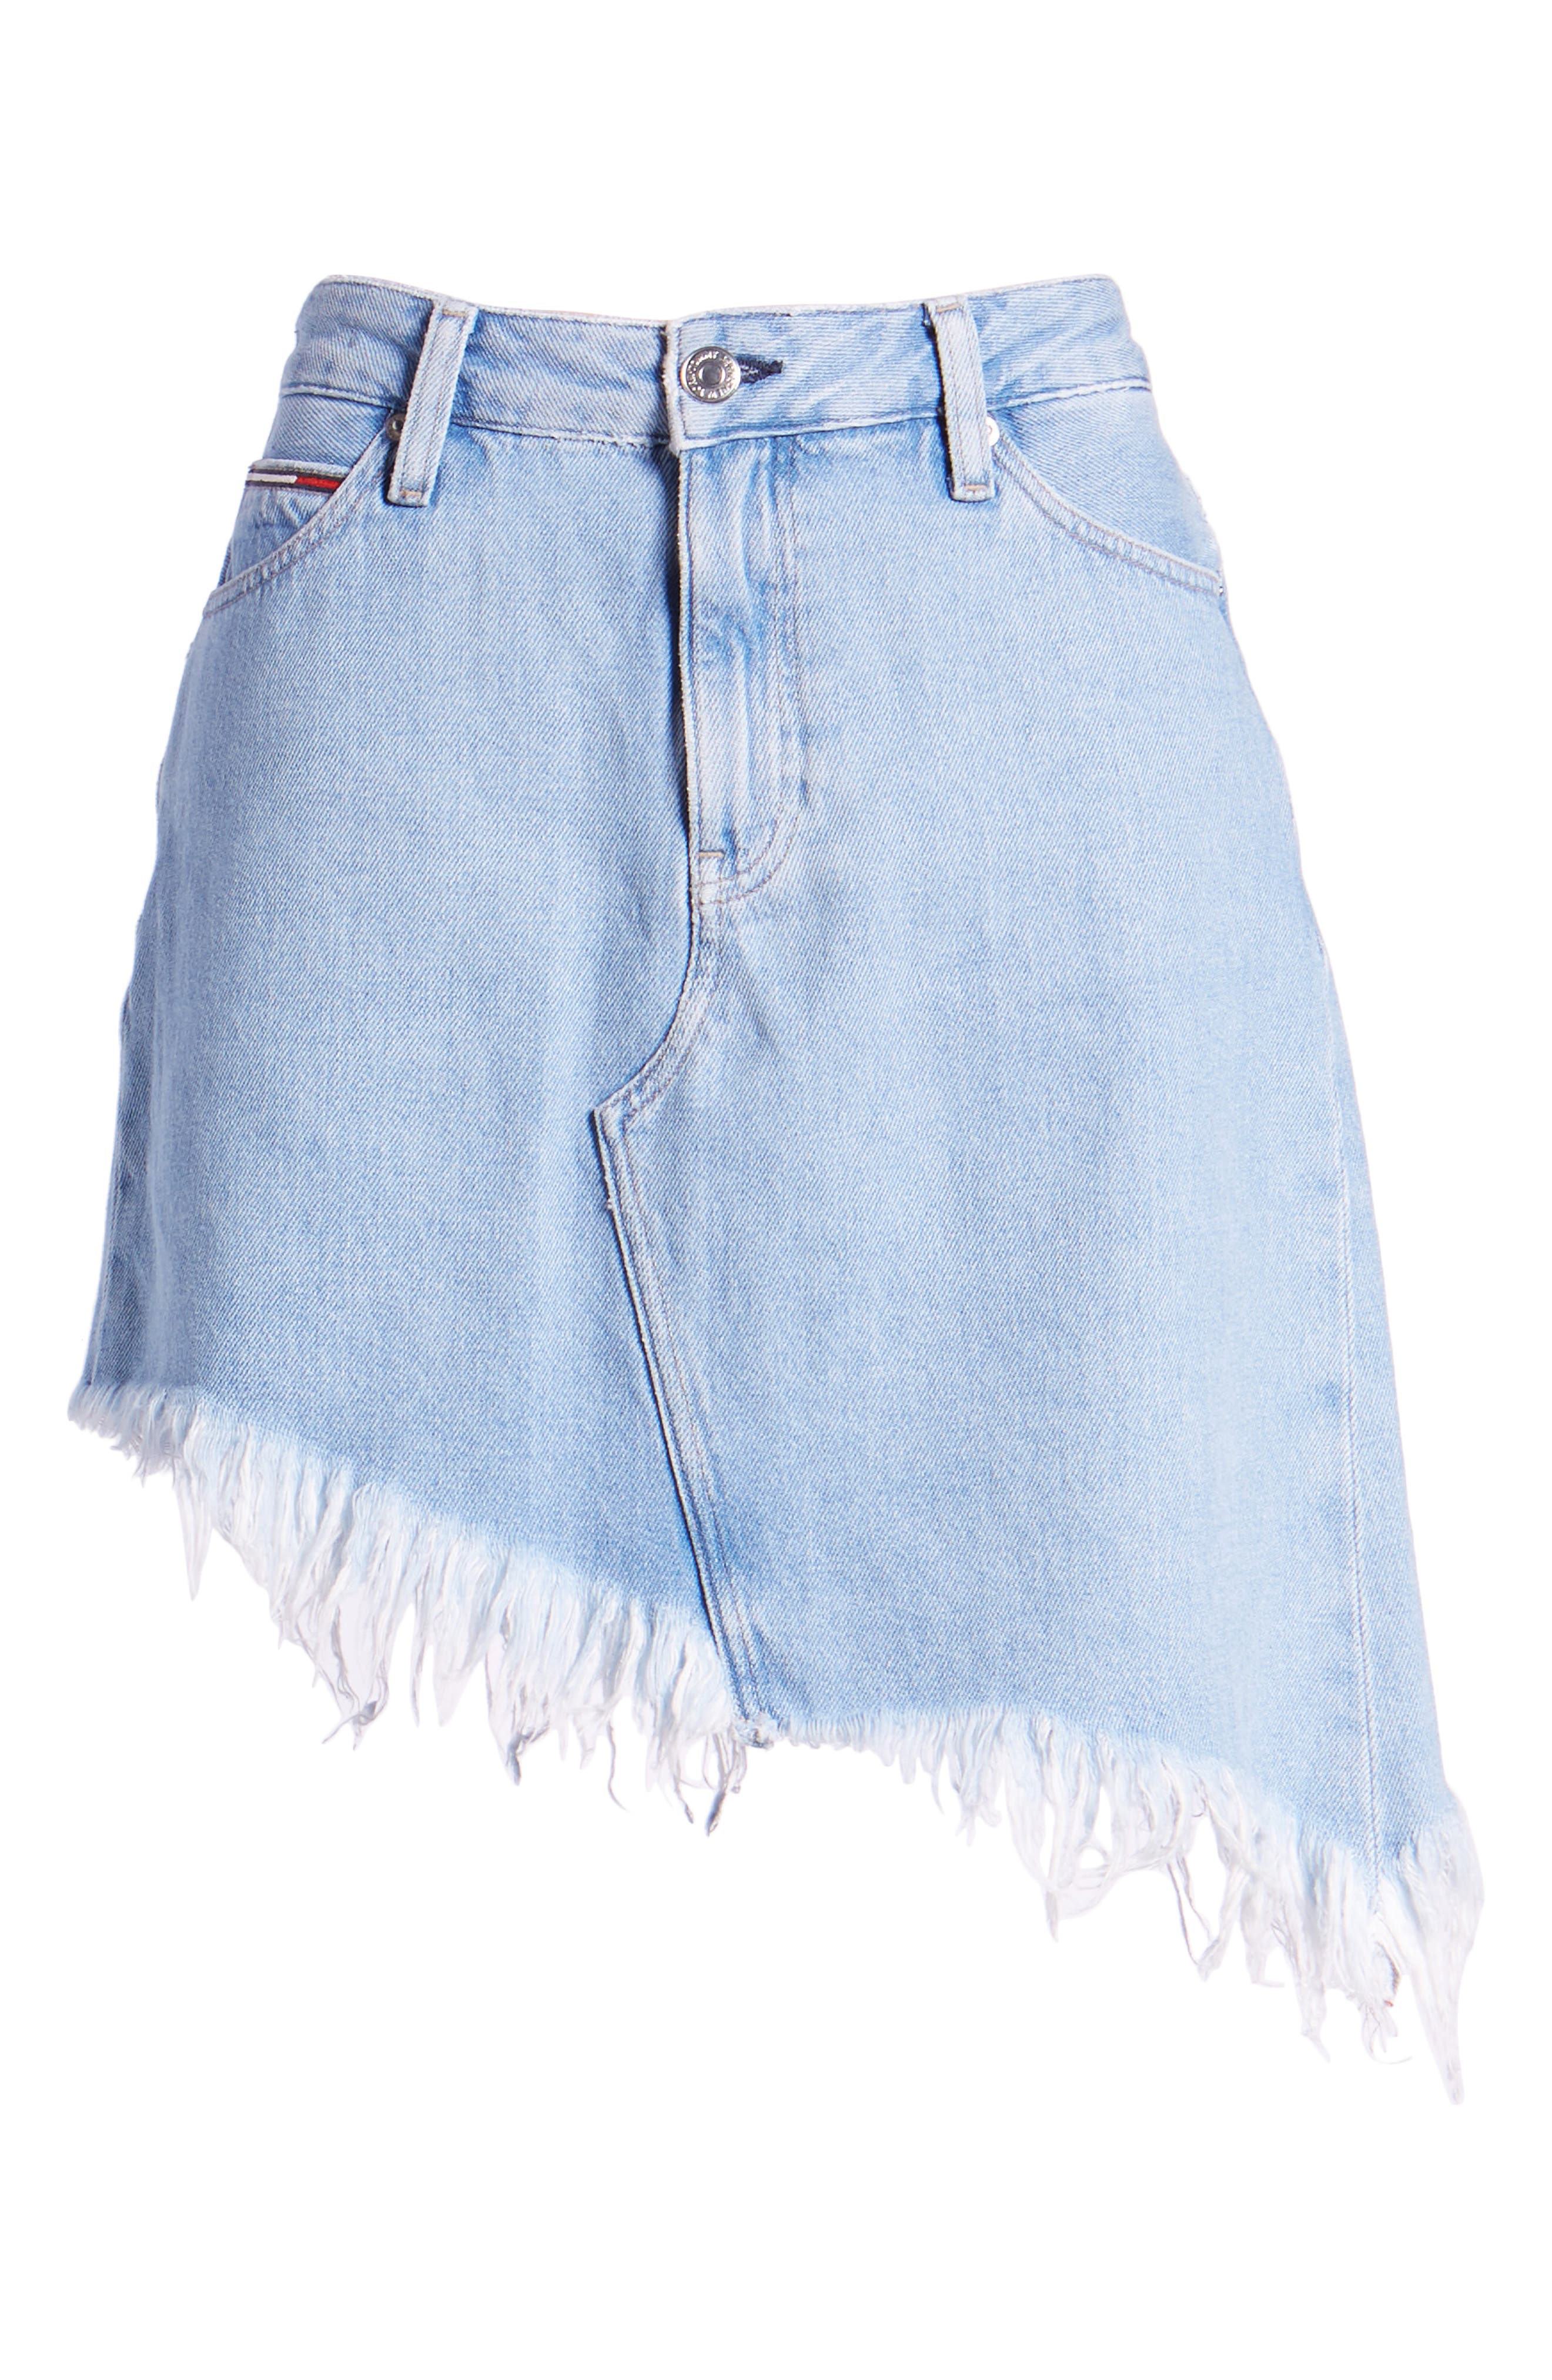 Asymmetrical Denim Skirt,                             Alternate thumbnail 7, color,                             Raw Destructed Blue Rigid